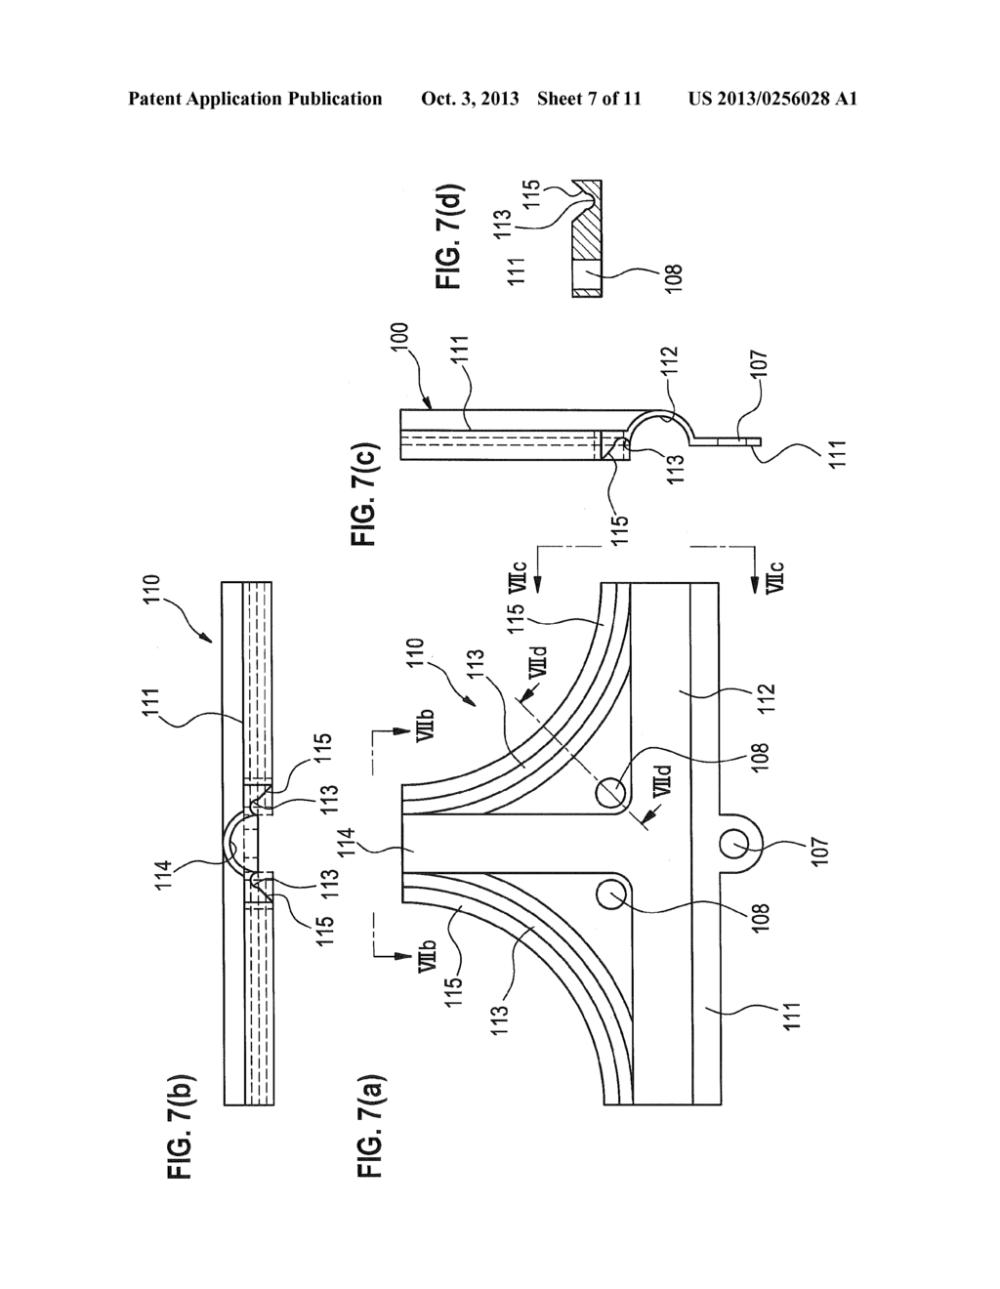 medium resolution of coleman evcon wiring diagram dgaa077bdtb auto electrical wiringevcon dgat070bdd furnace wiring diagram coleman mach